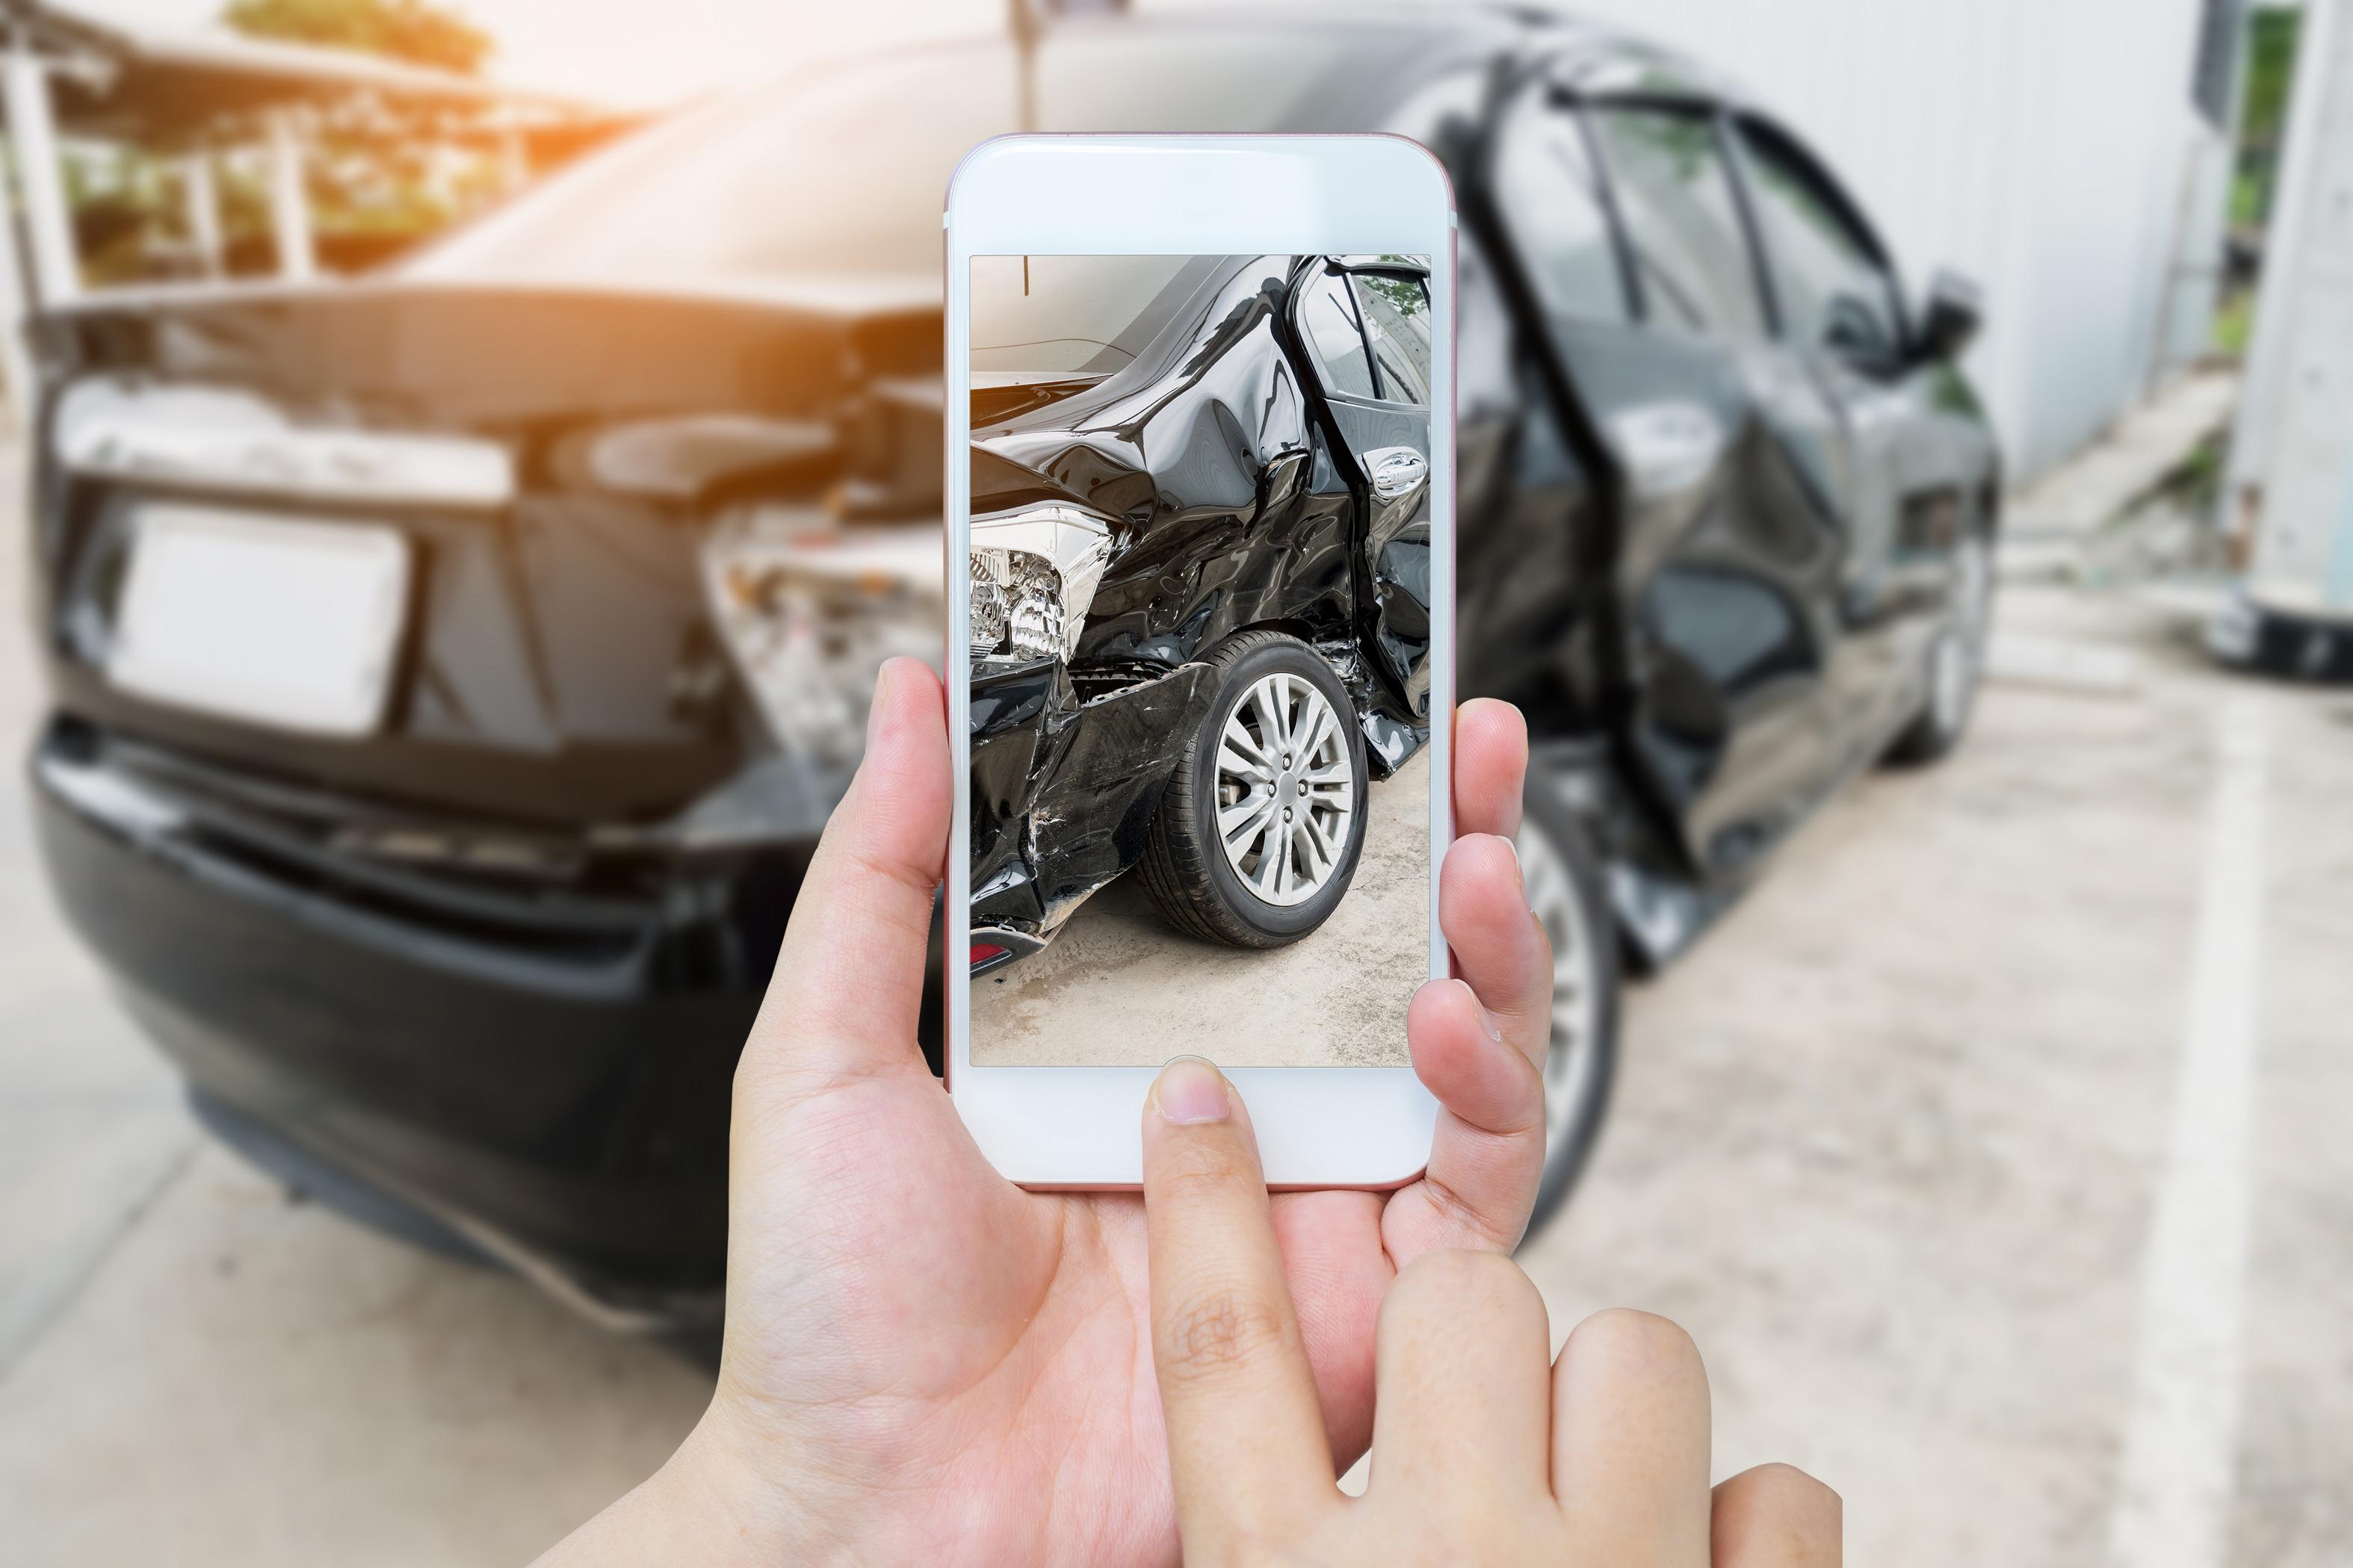 car accident photo smartphone